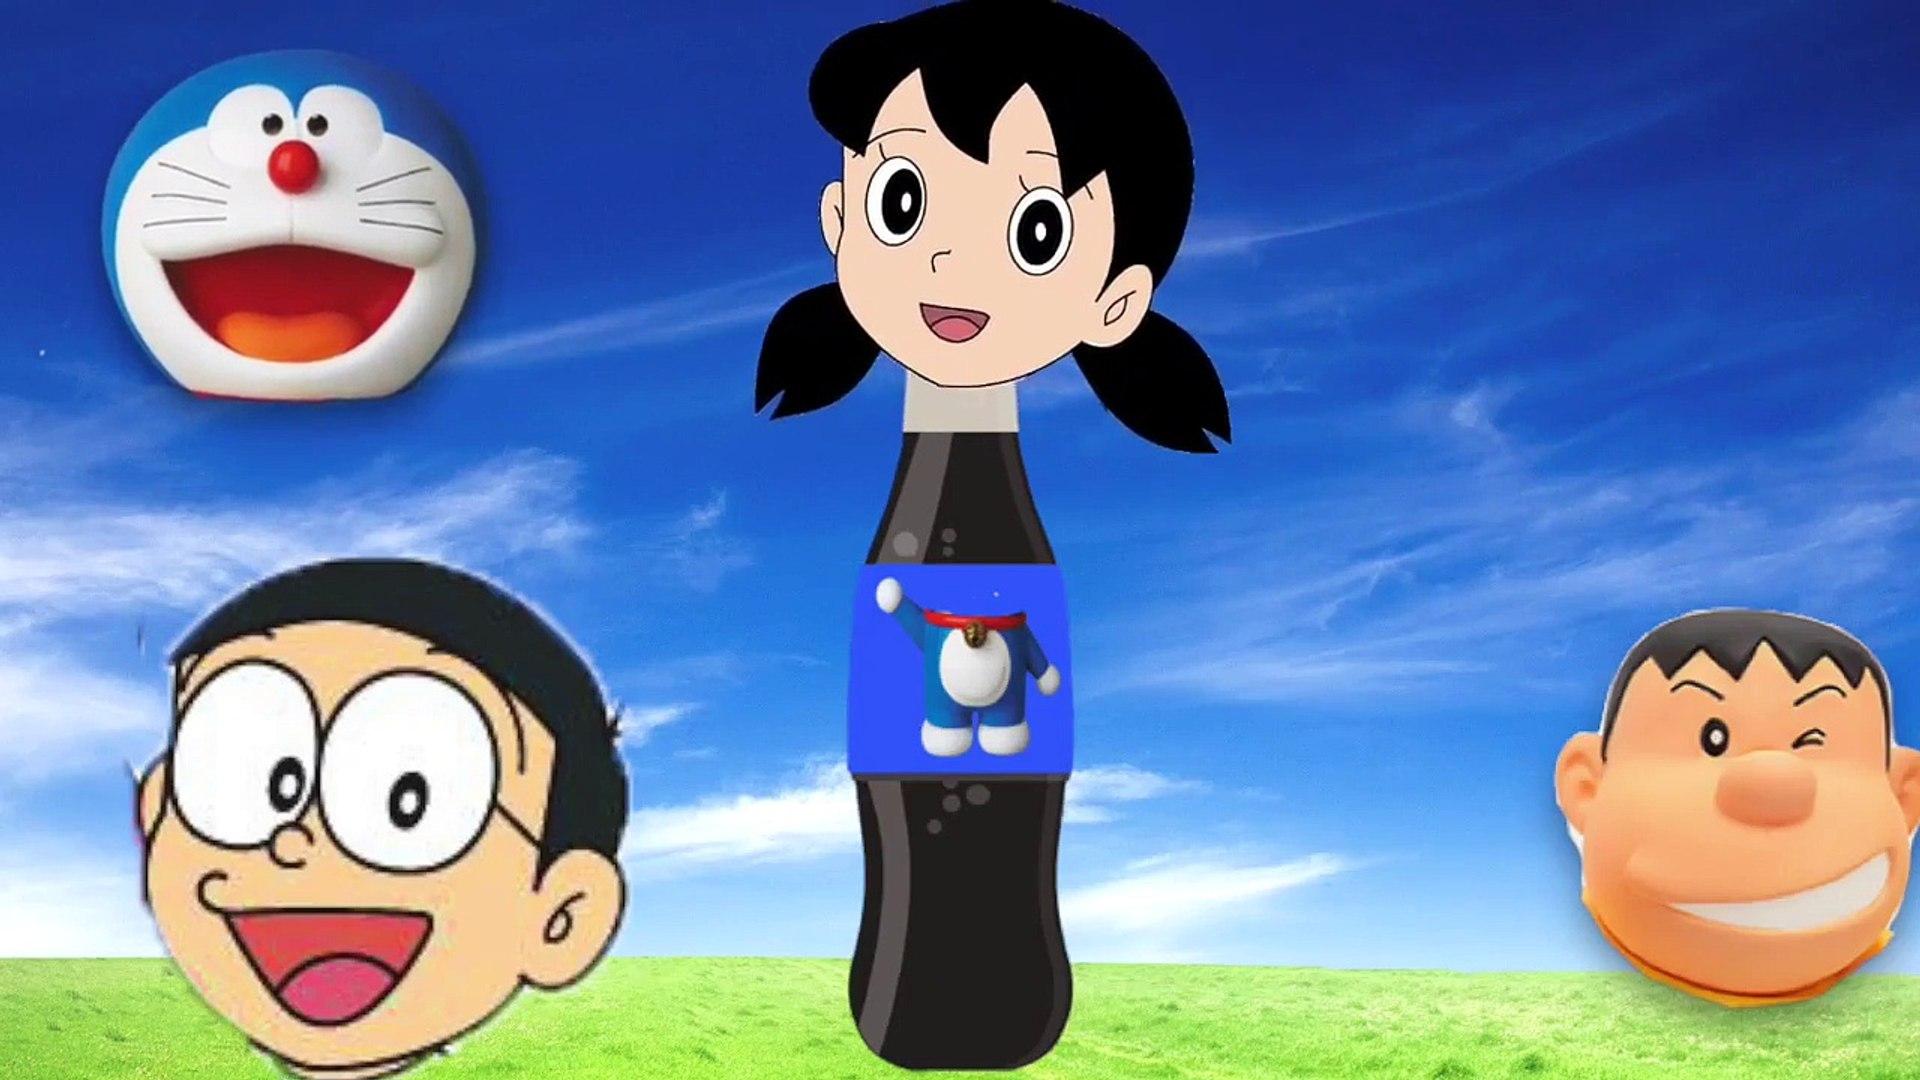 Coloring Doraemon Urdu - Bowstomatch